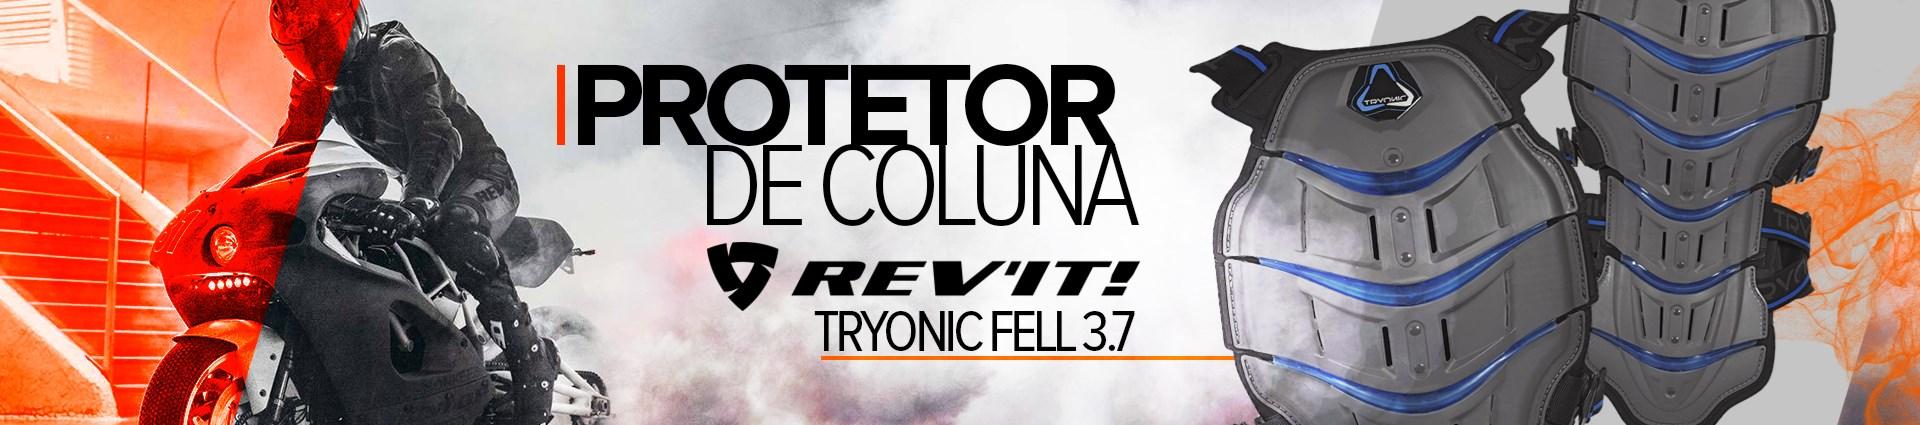 Revit - Protetor de Coluna Tryonic